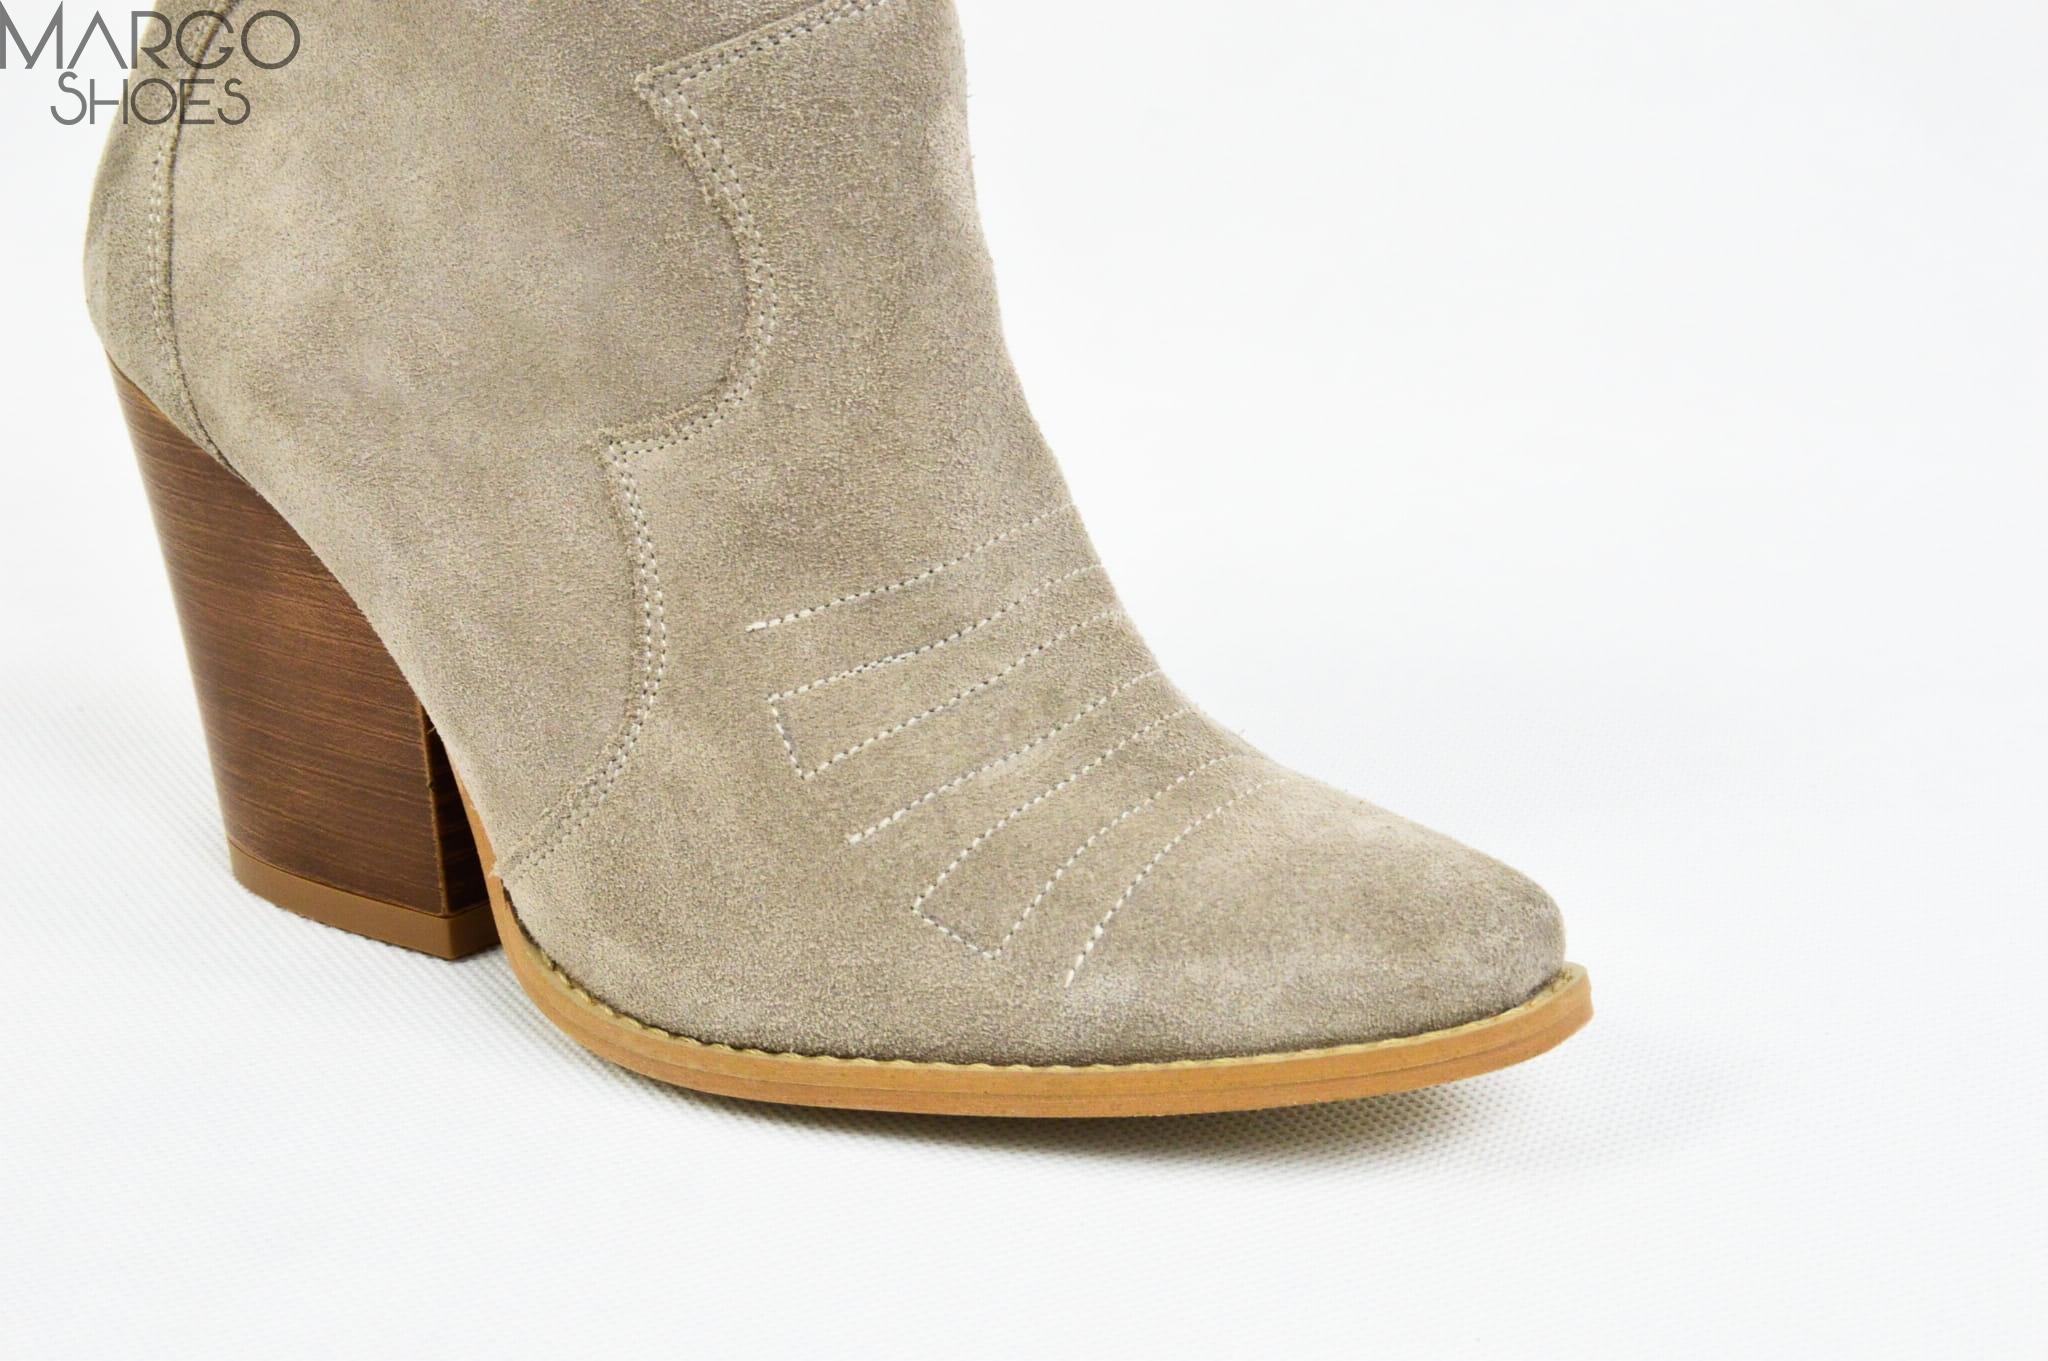 Botki kowbojki skórzane cappucino